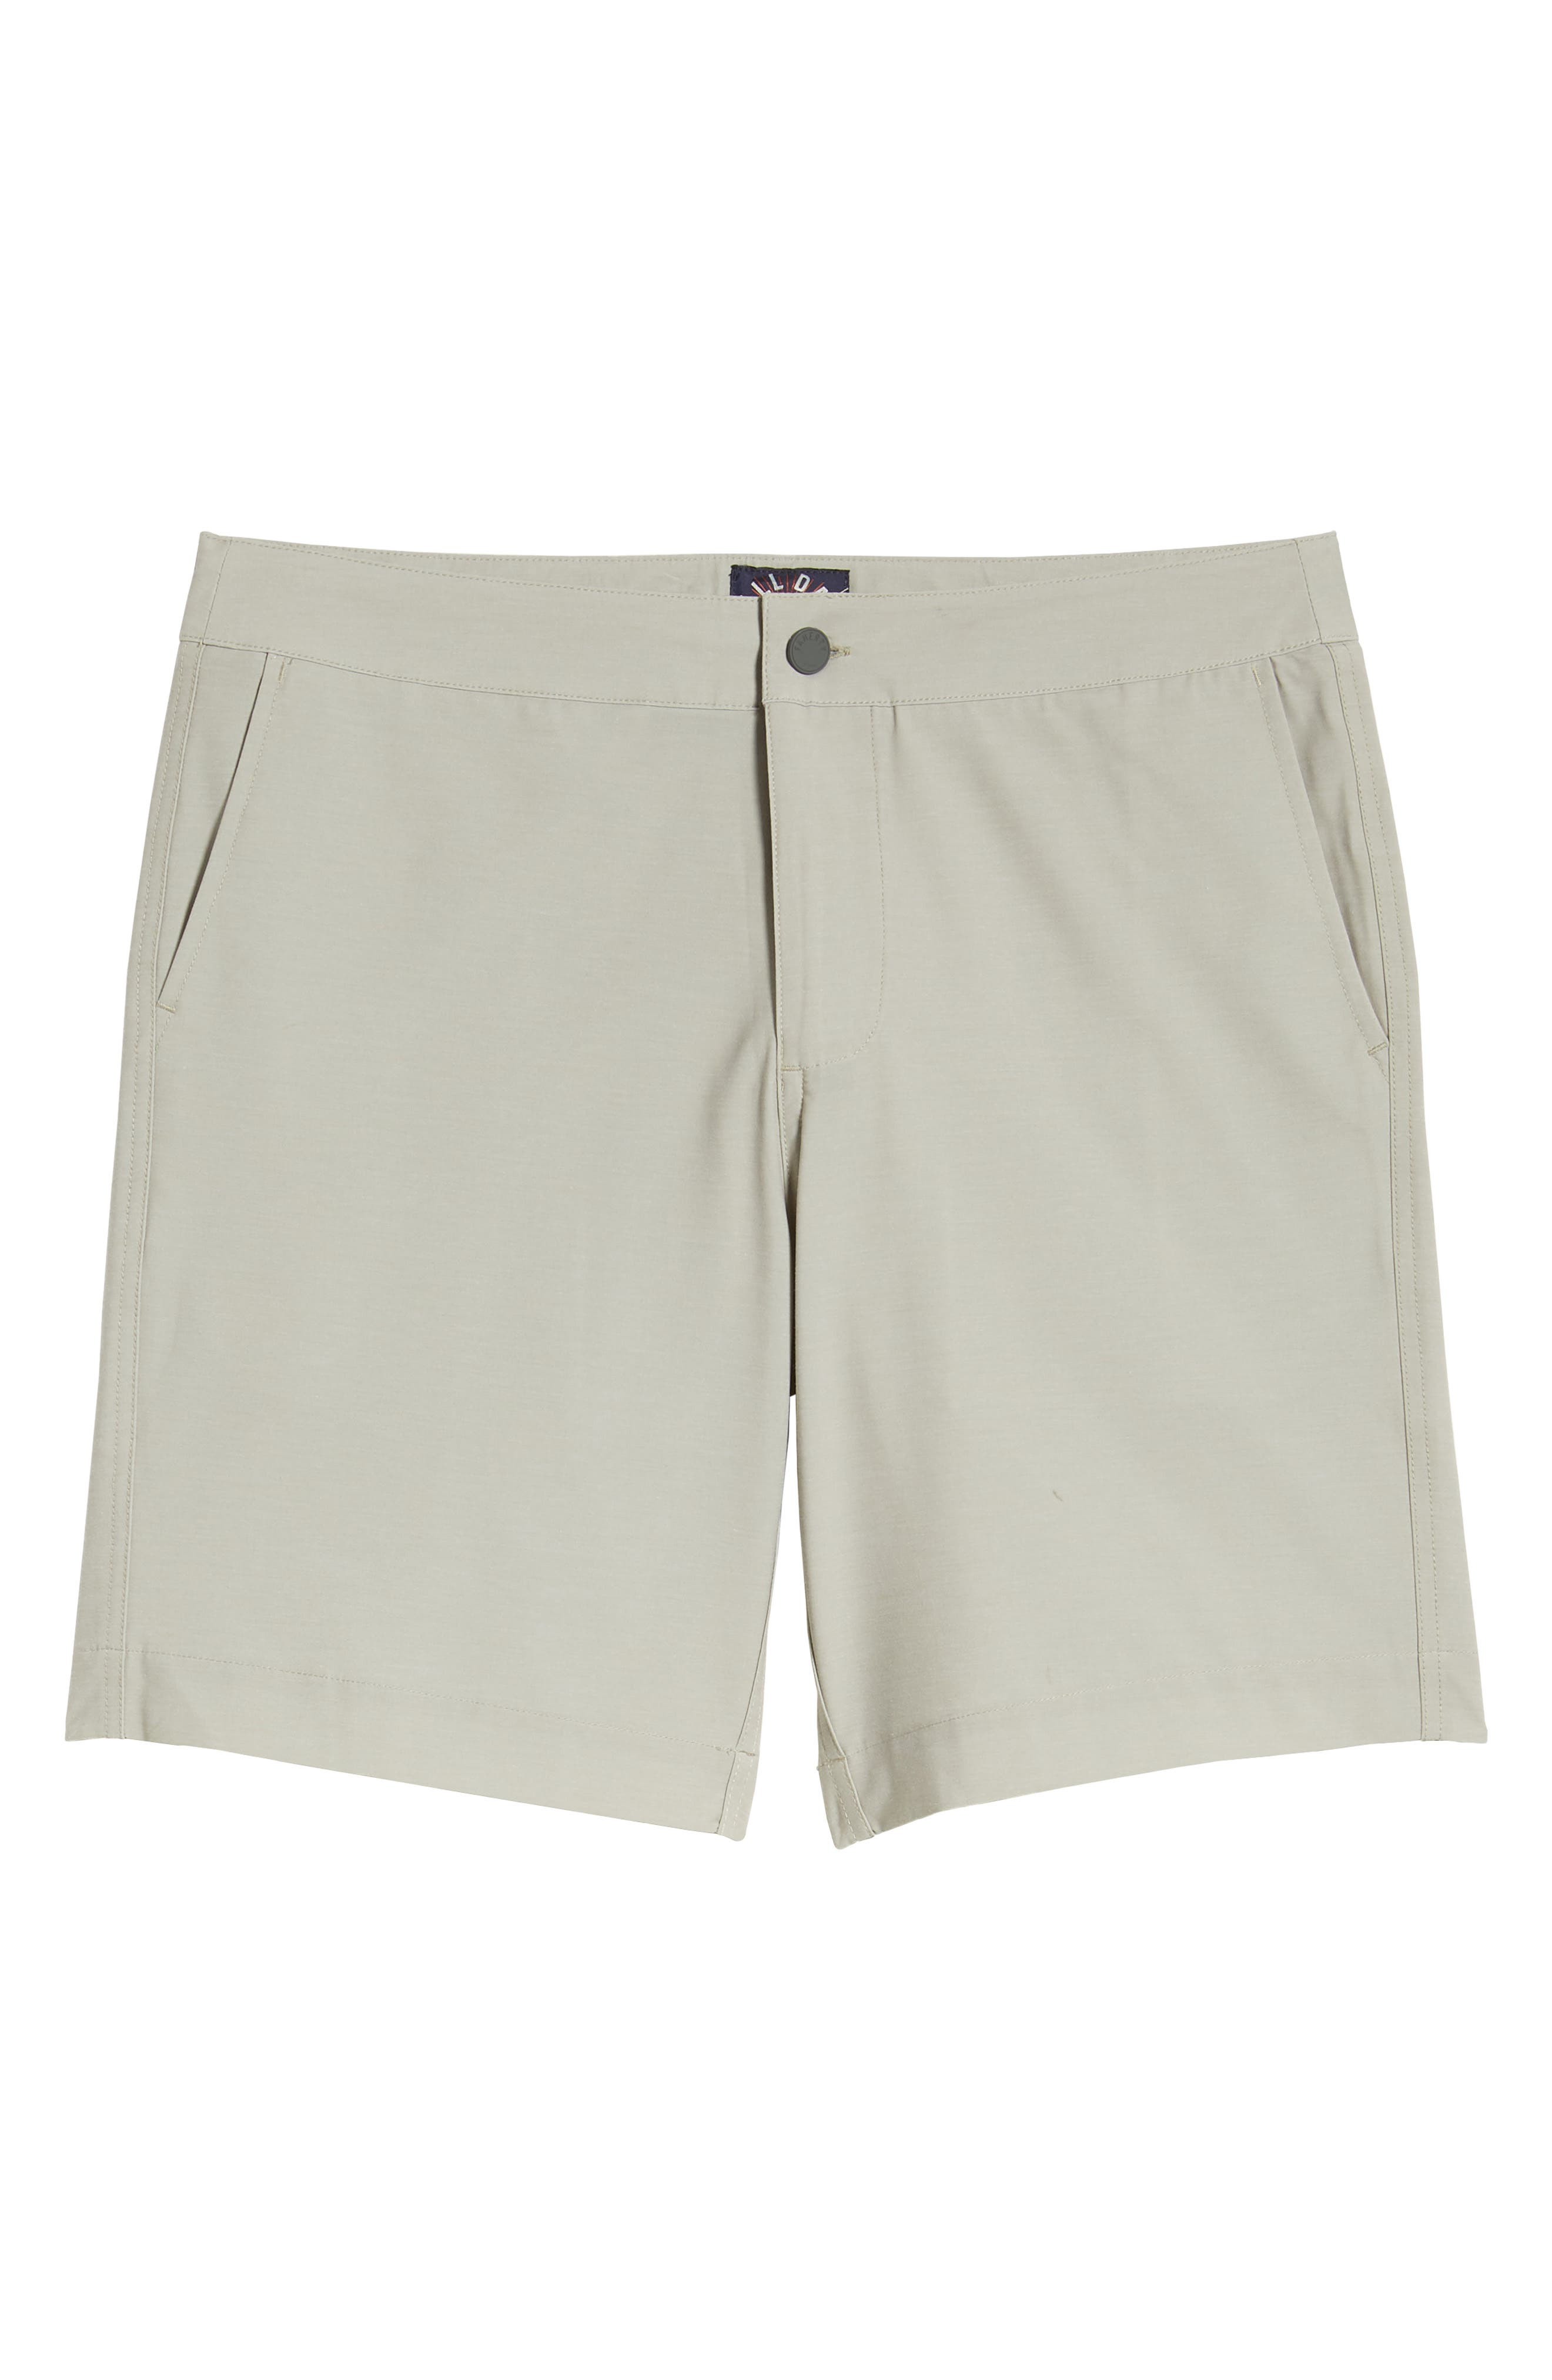 FAHERTY,                             All Day Flat Front Shorts,                             Alternate thumbnail 6, color,                             KHAKI